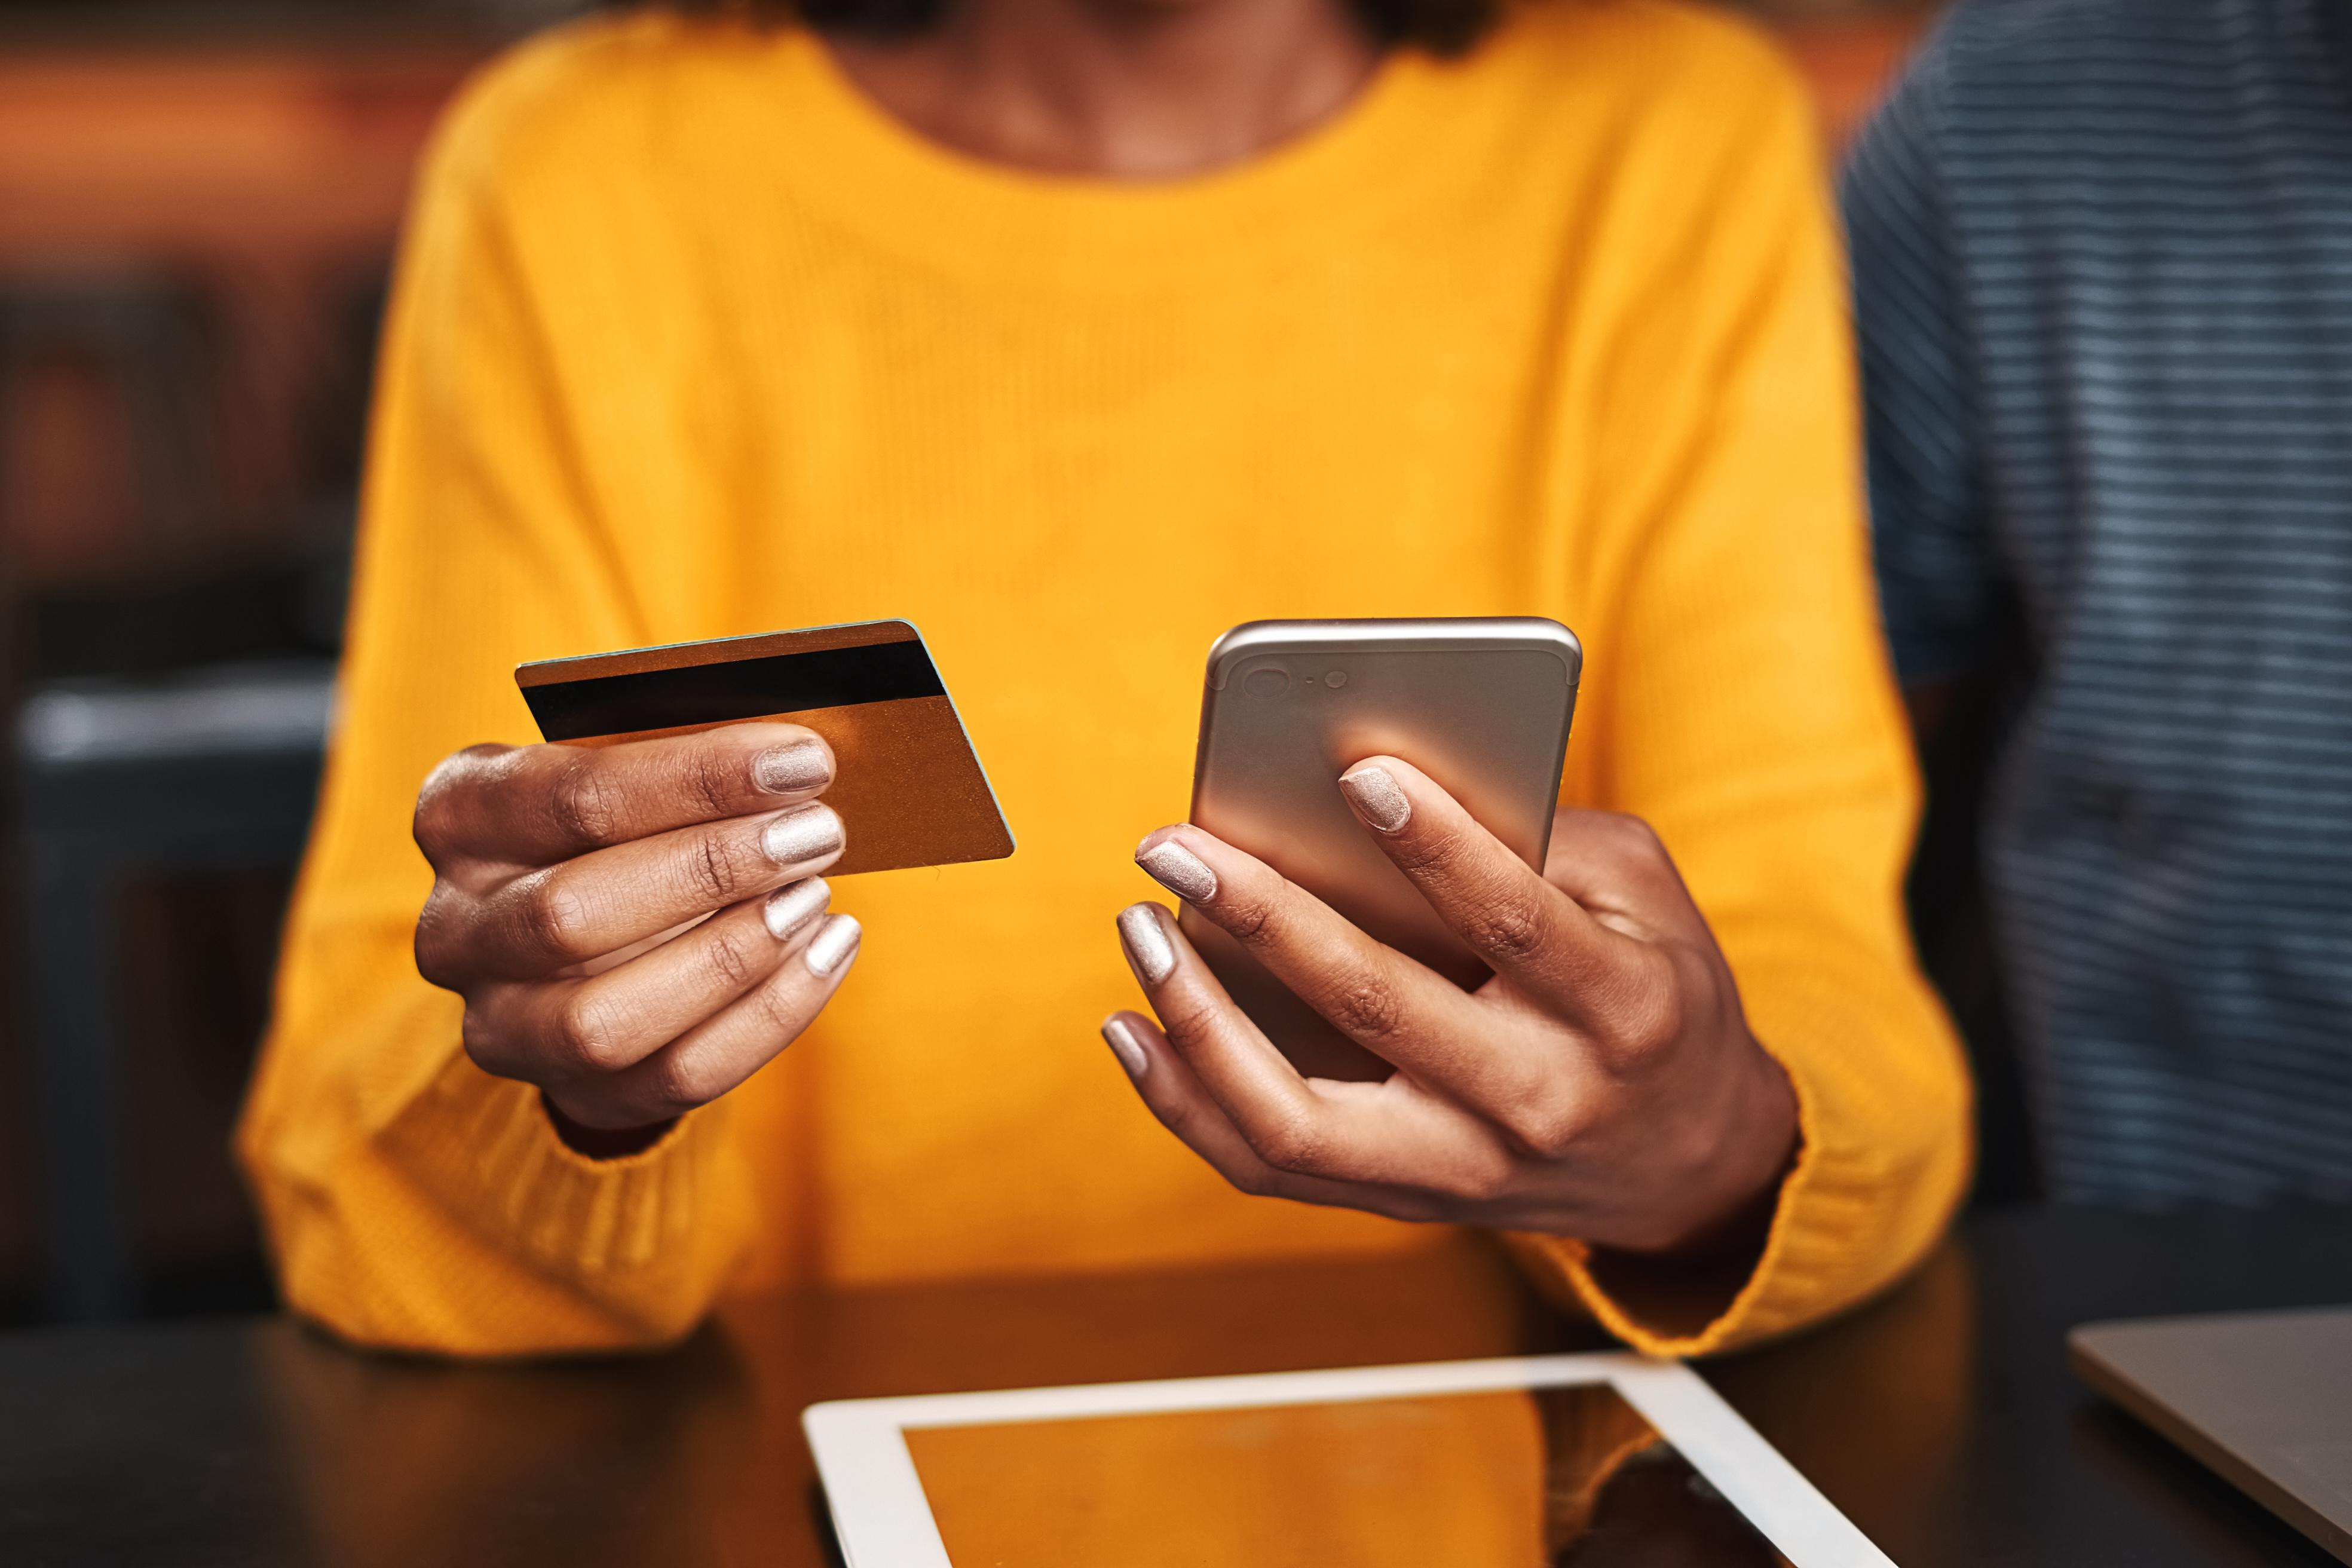 The Case For Going Cashless